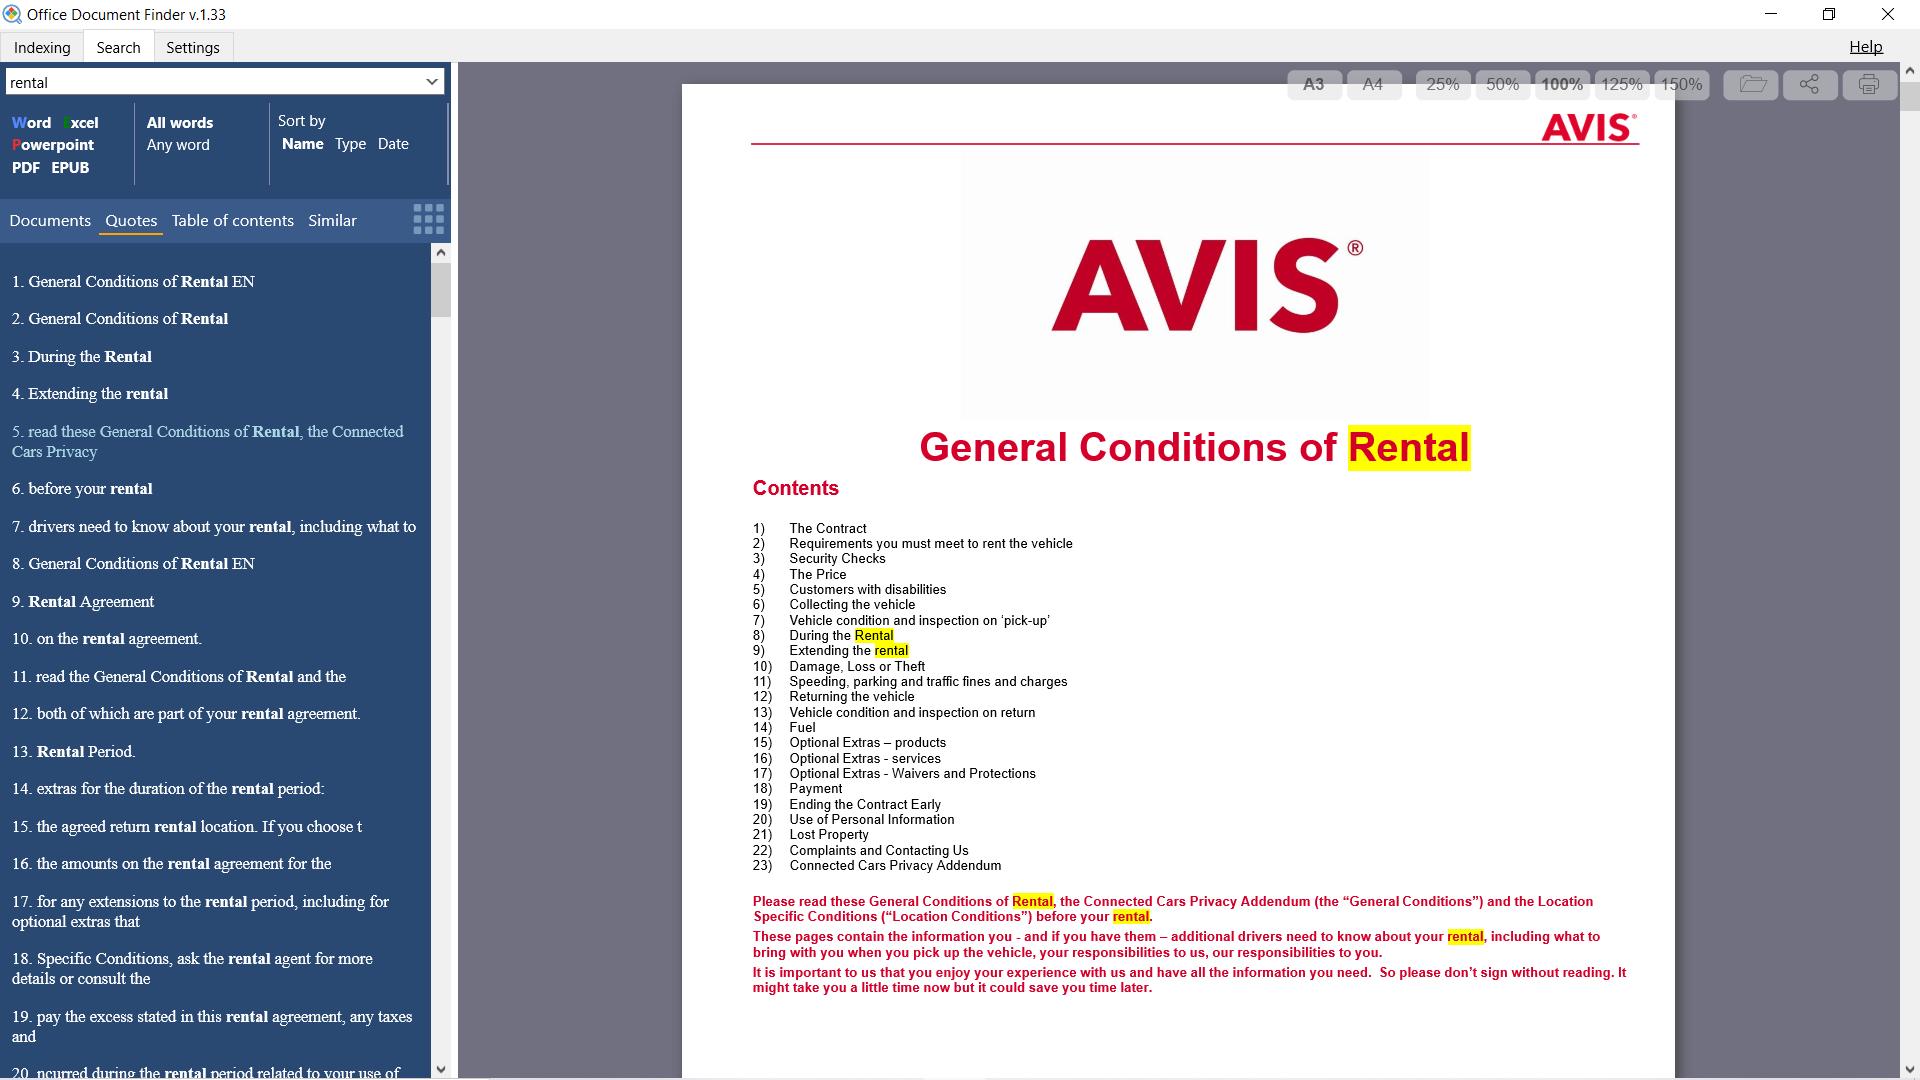 Office Document Finder, Document Management Software Screenshot